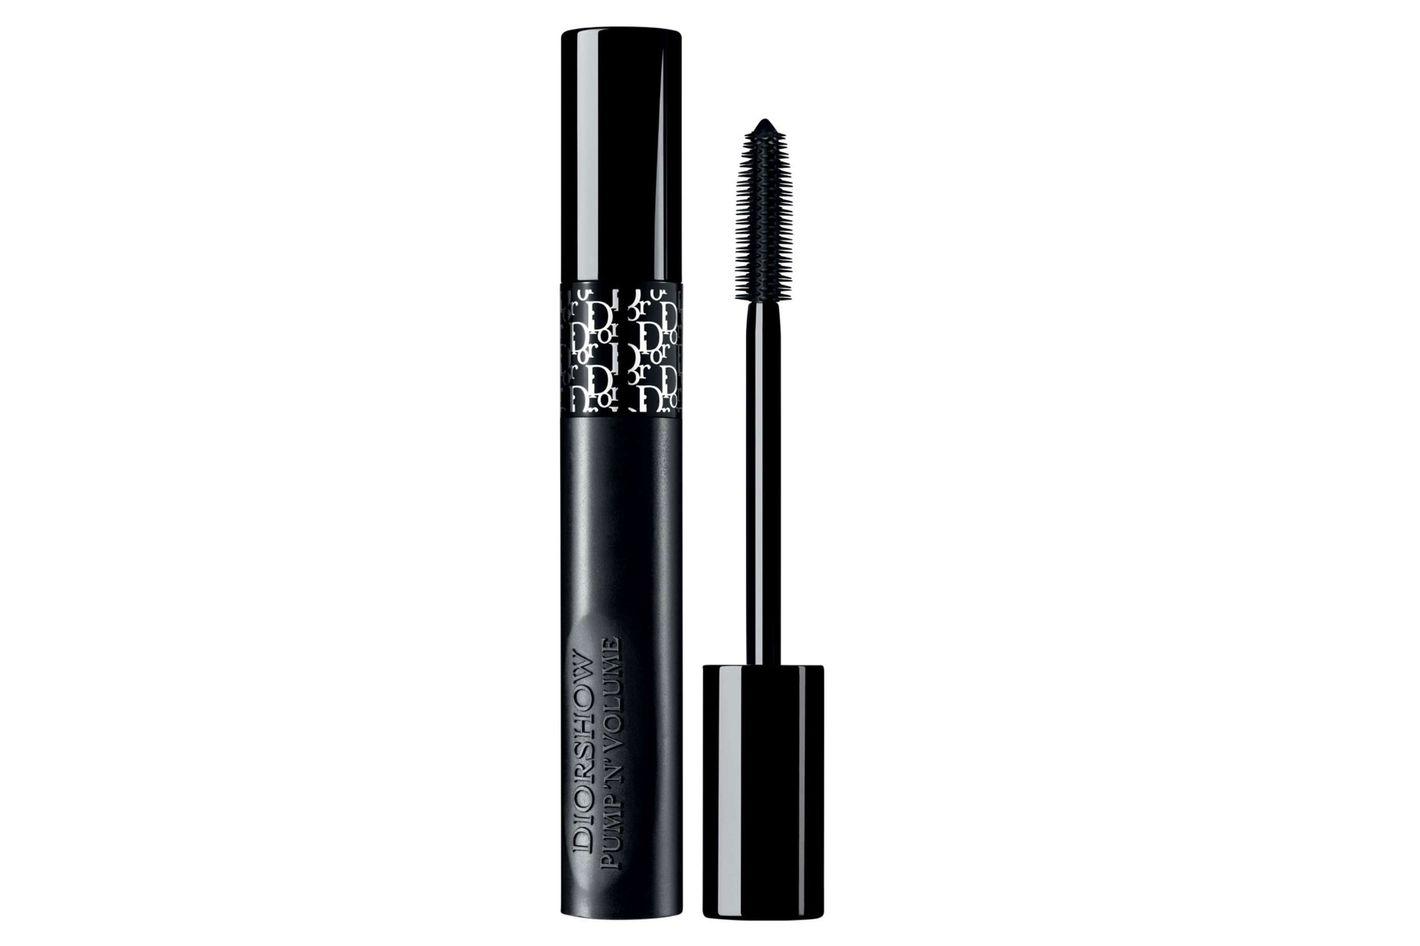 Dior Diorshow PumpnVolume Instant Volume Squeezable Mascara